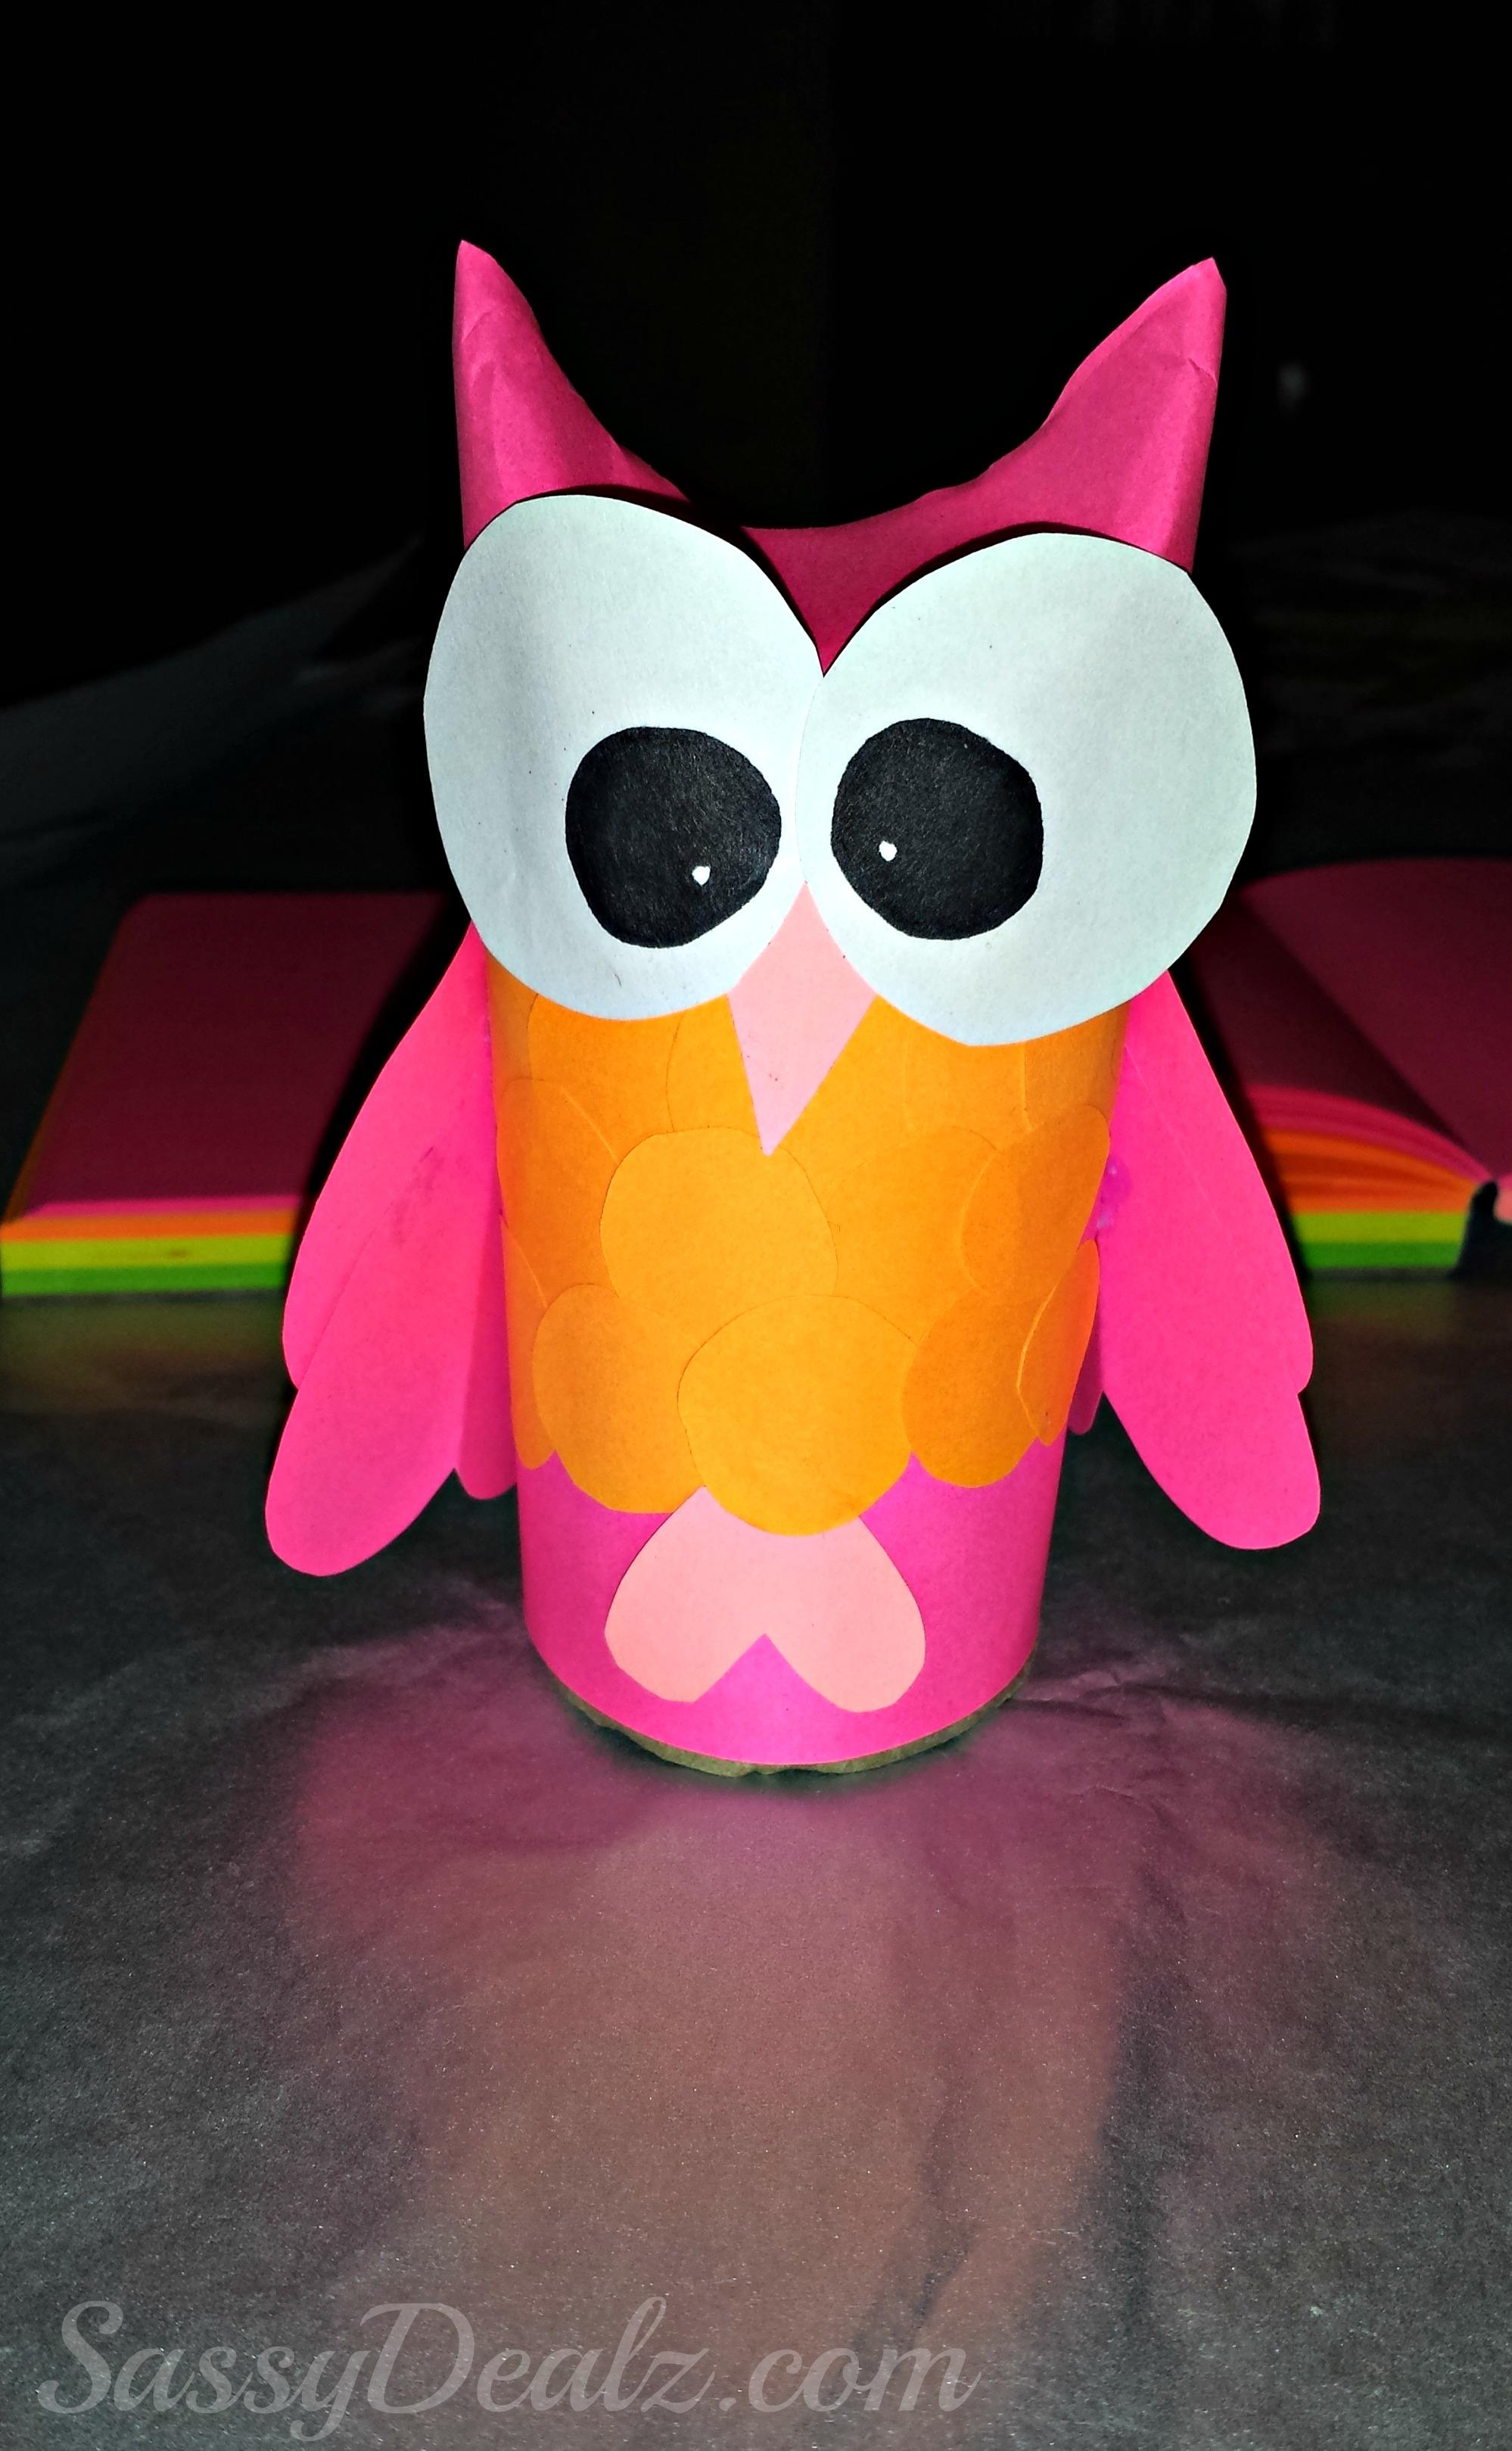 Diy owl toilet paper roll craft for kids crafty morning for Diy paper crafts for kids